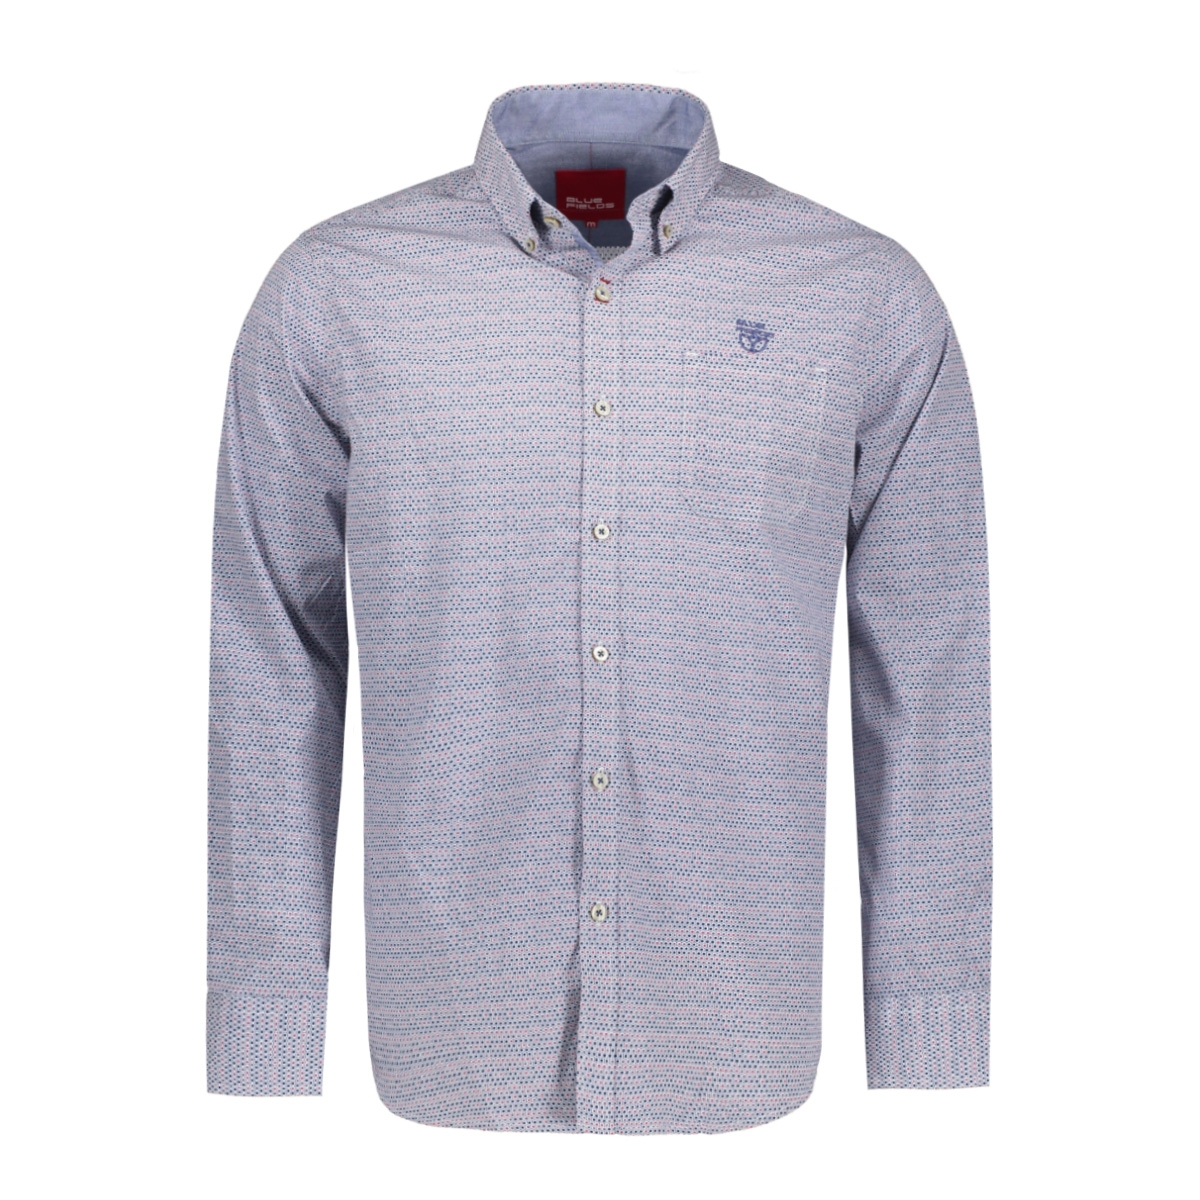 214-37001 bluefields overhemd 4257